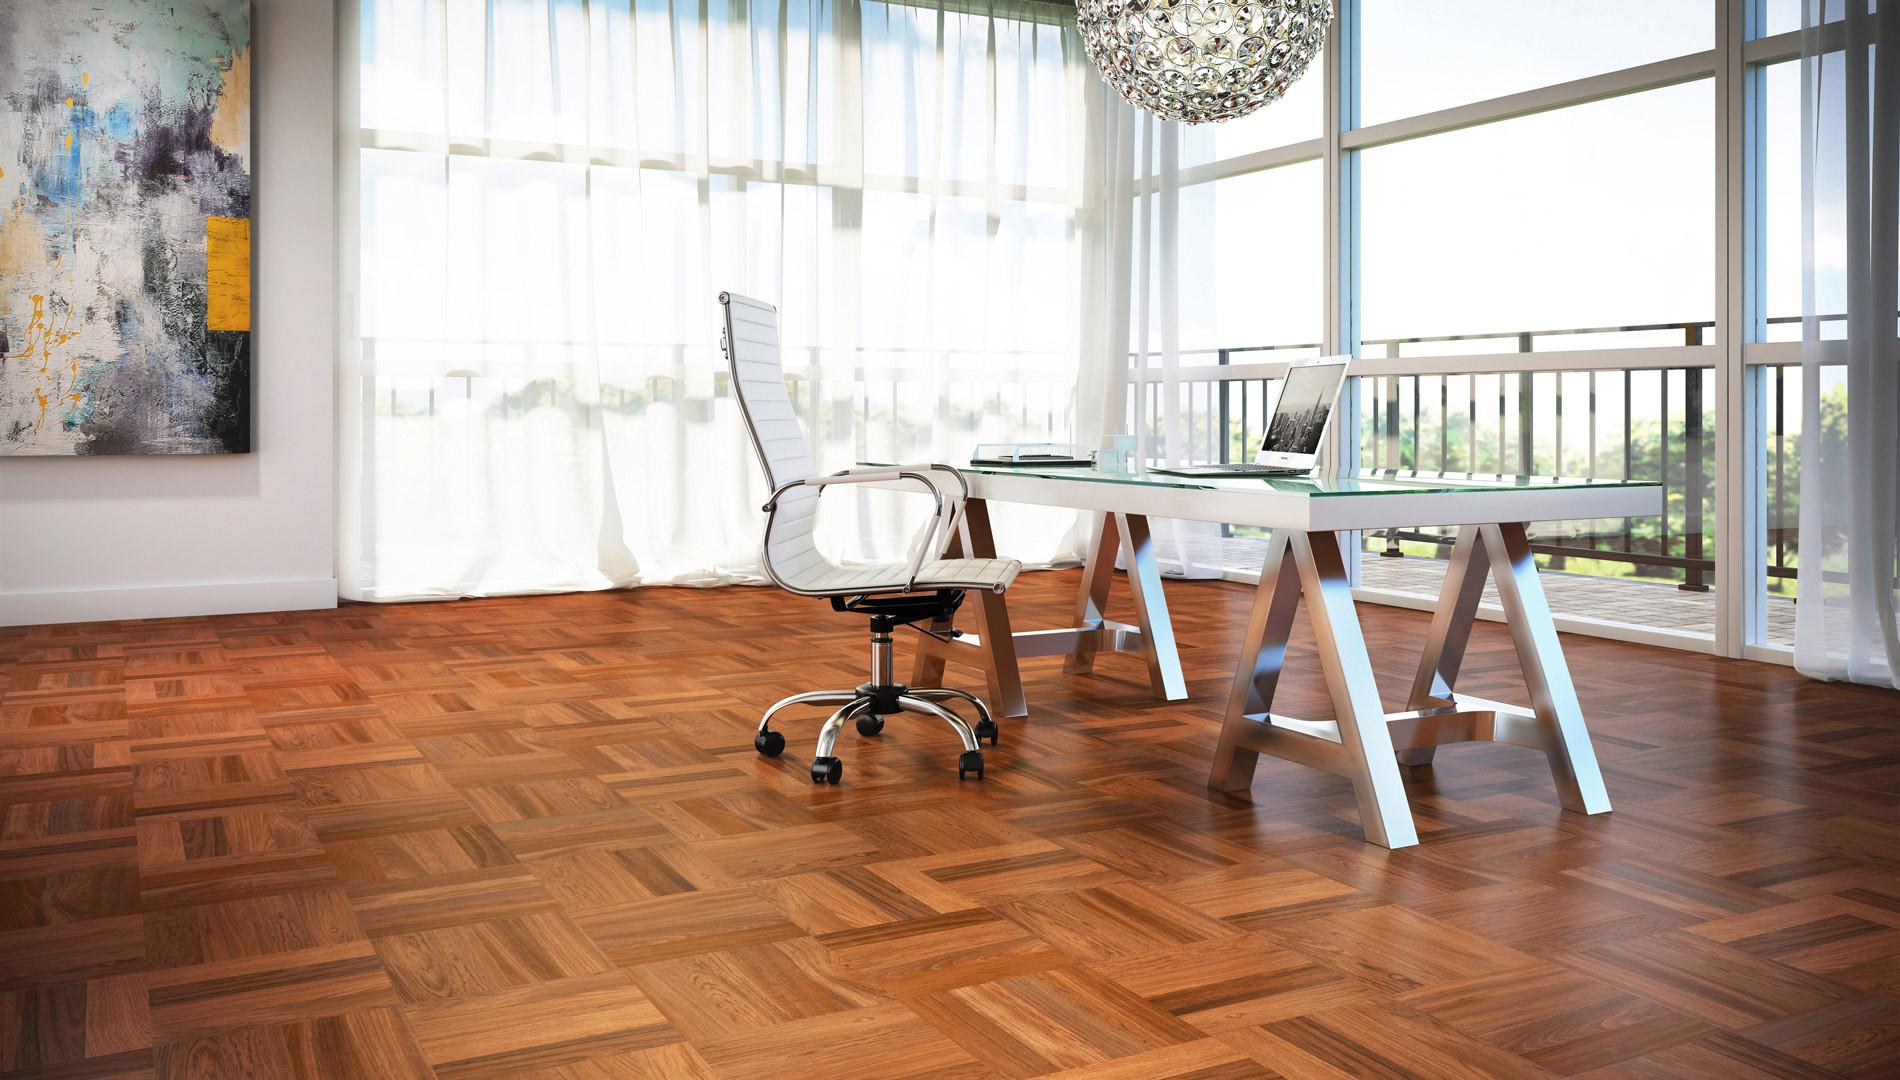 lauzon hardwood flooring distributors of news lauzon hardwood flooring with regard to office brazilian cherry hardwood flooring brown natural designer lauzon1